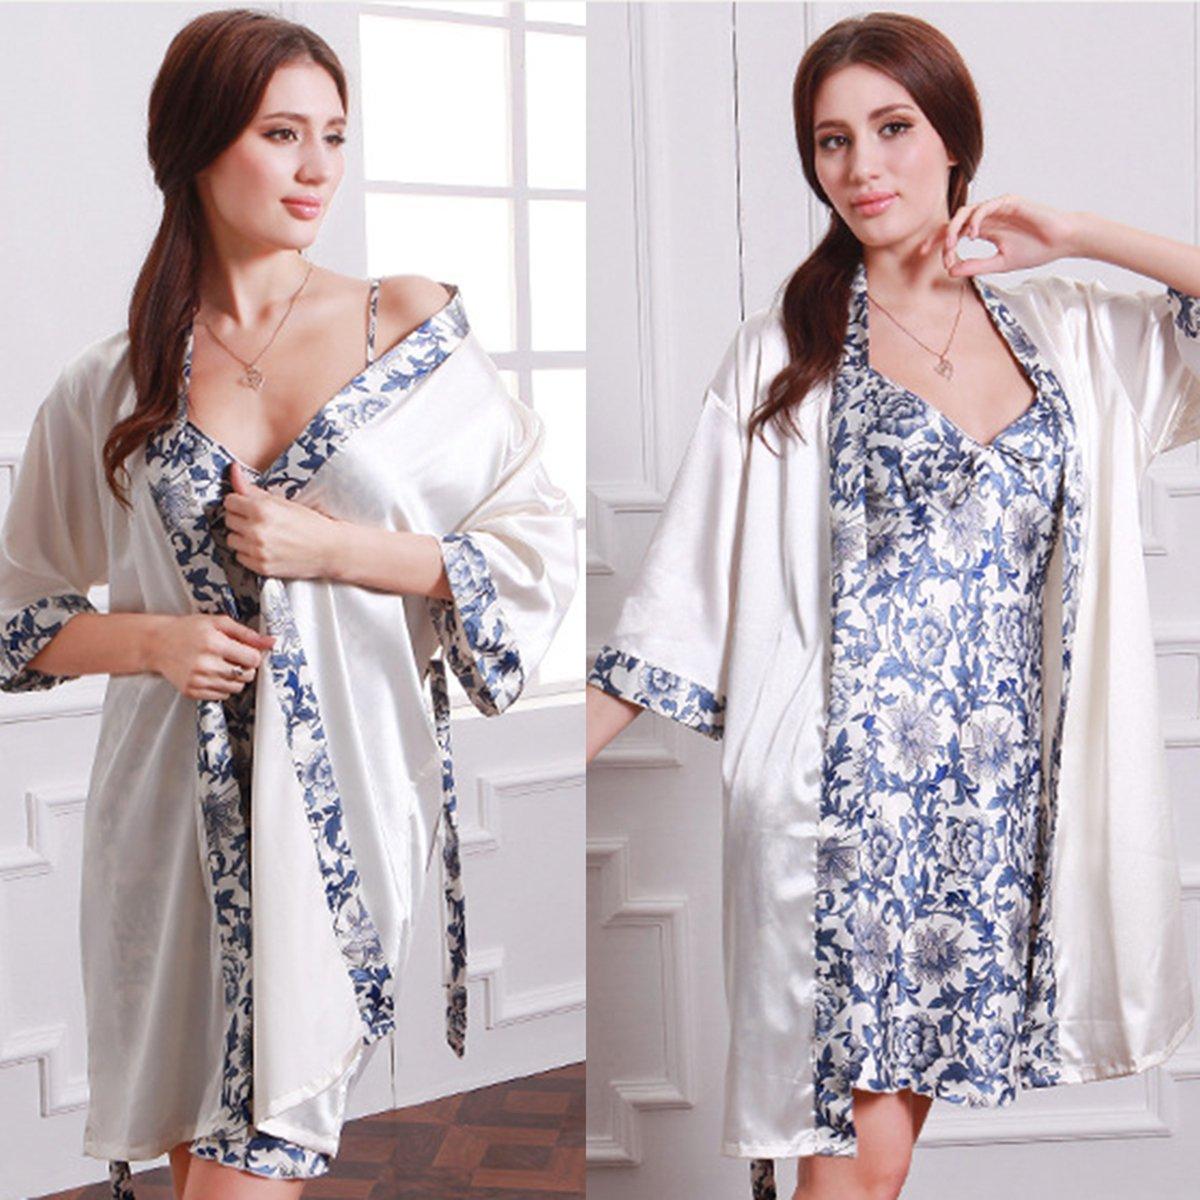 ff16ec903c Summer Luxury Women Sleepwear Faux Silk Sleepwear Robe Gown Sets Chinese  Porcelain Nightdress Floral Print Bathrobe 2 pcs Set